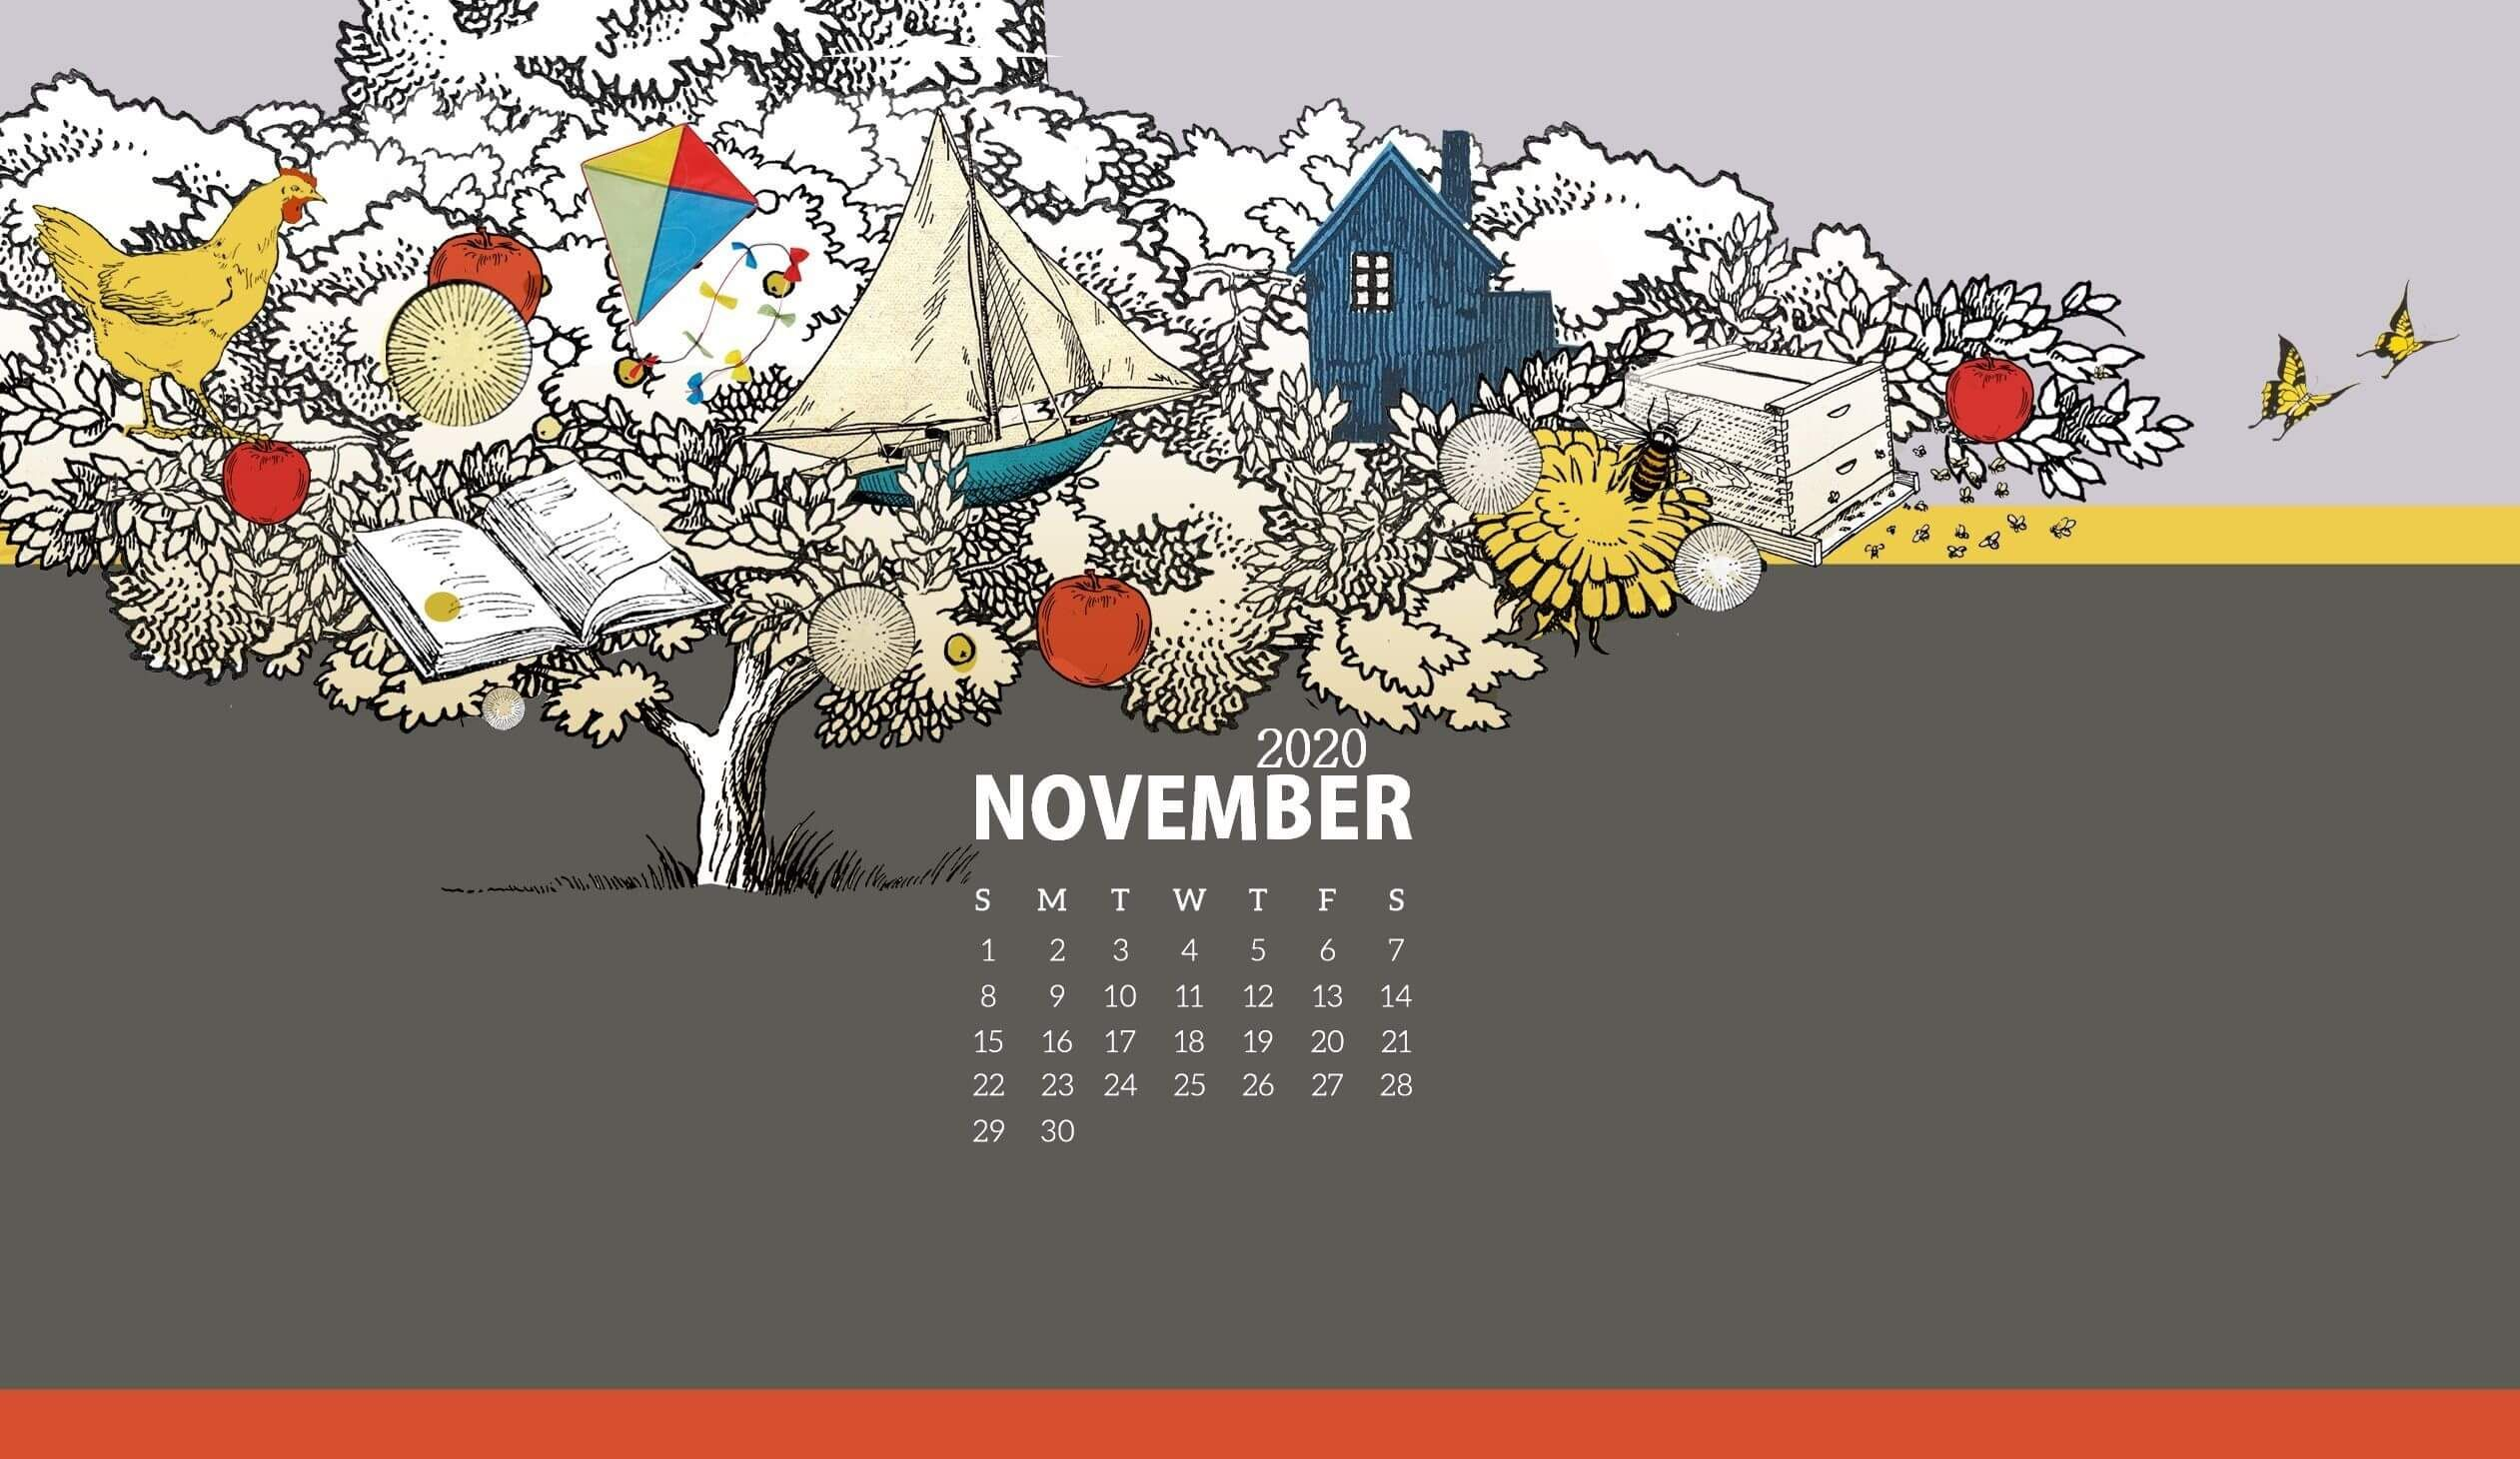 November 2020 Desktop Calendar Wallpaper in 2020